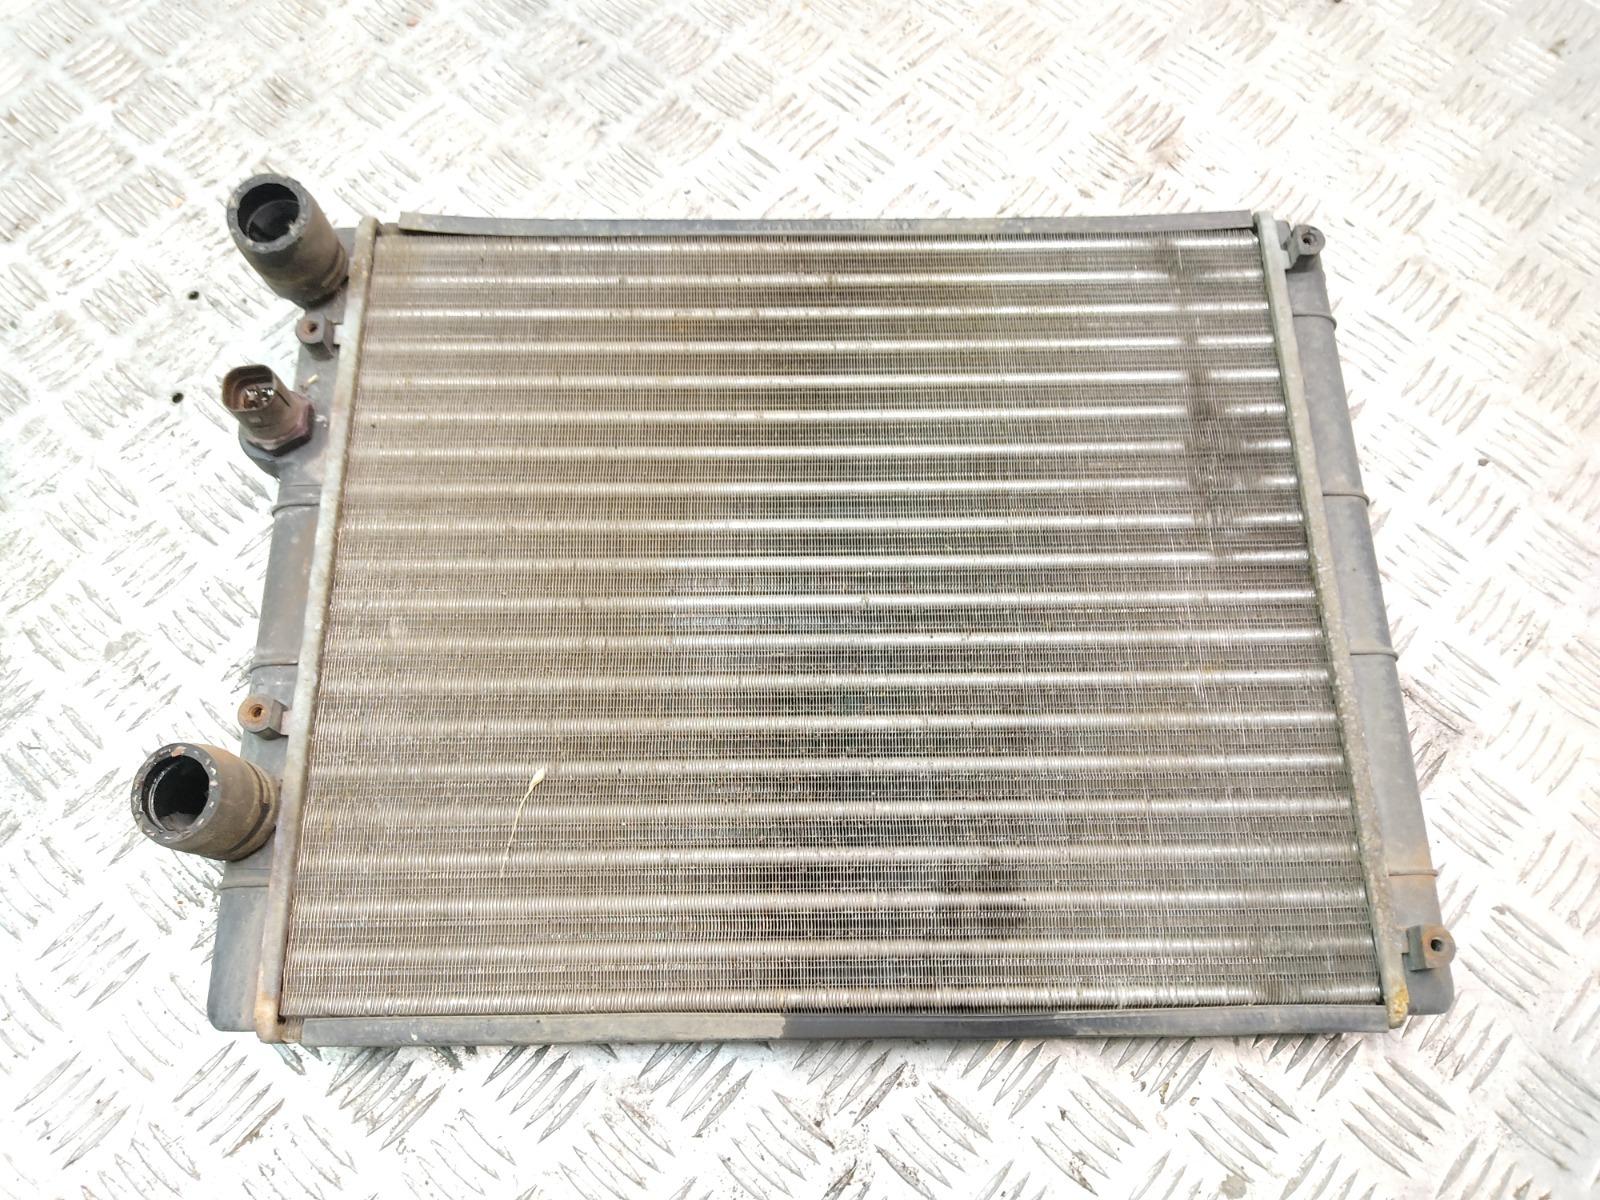 Радиатор (основной) Volkswagen Polo 1.4 I 2000 (б/у)